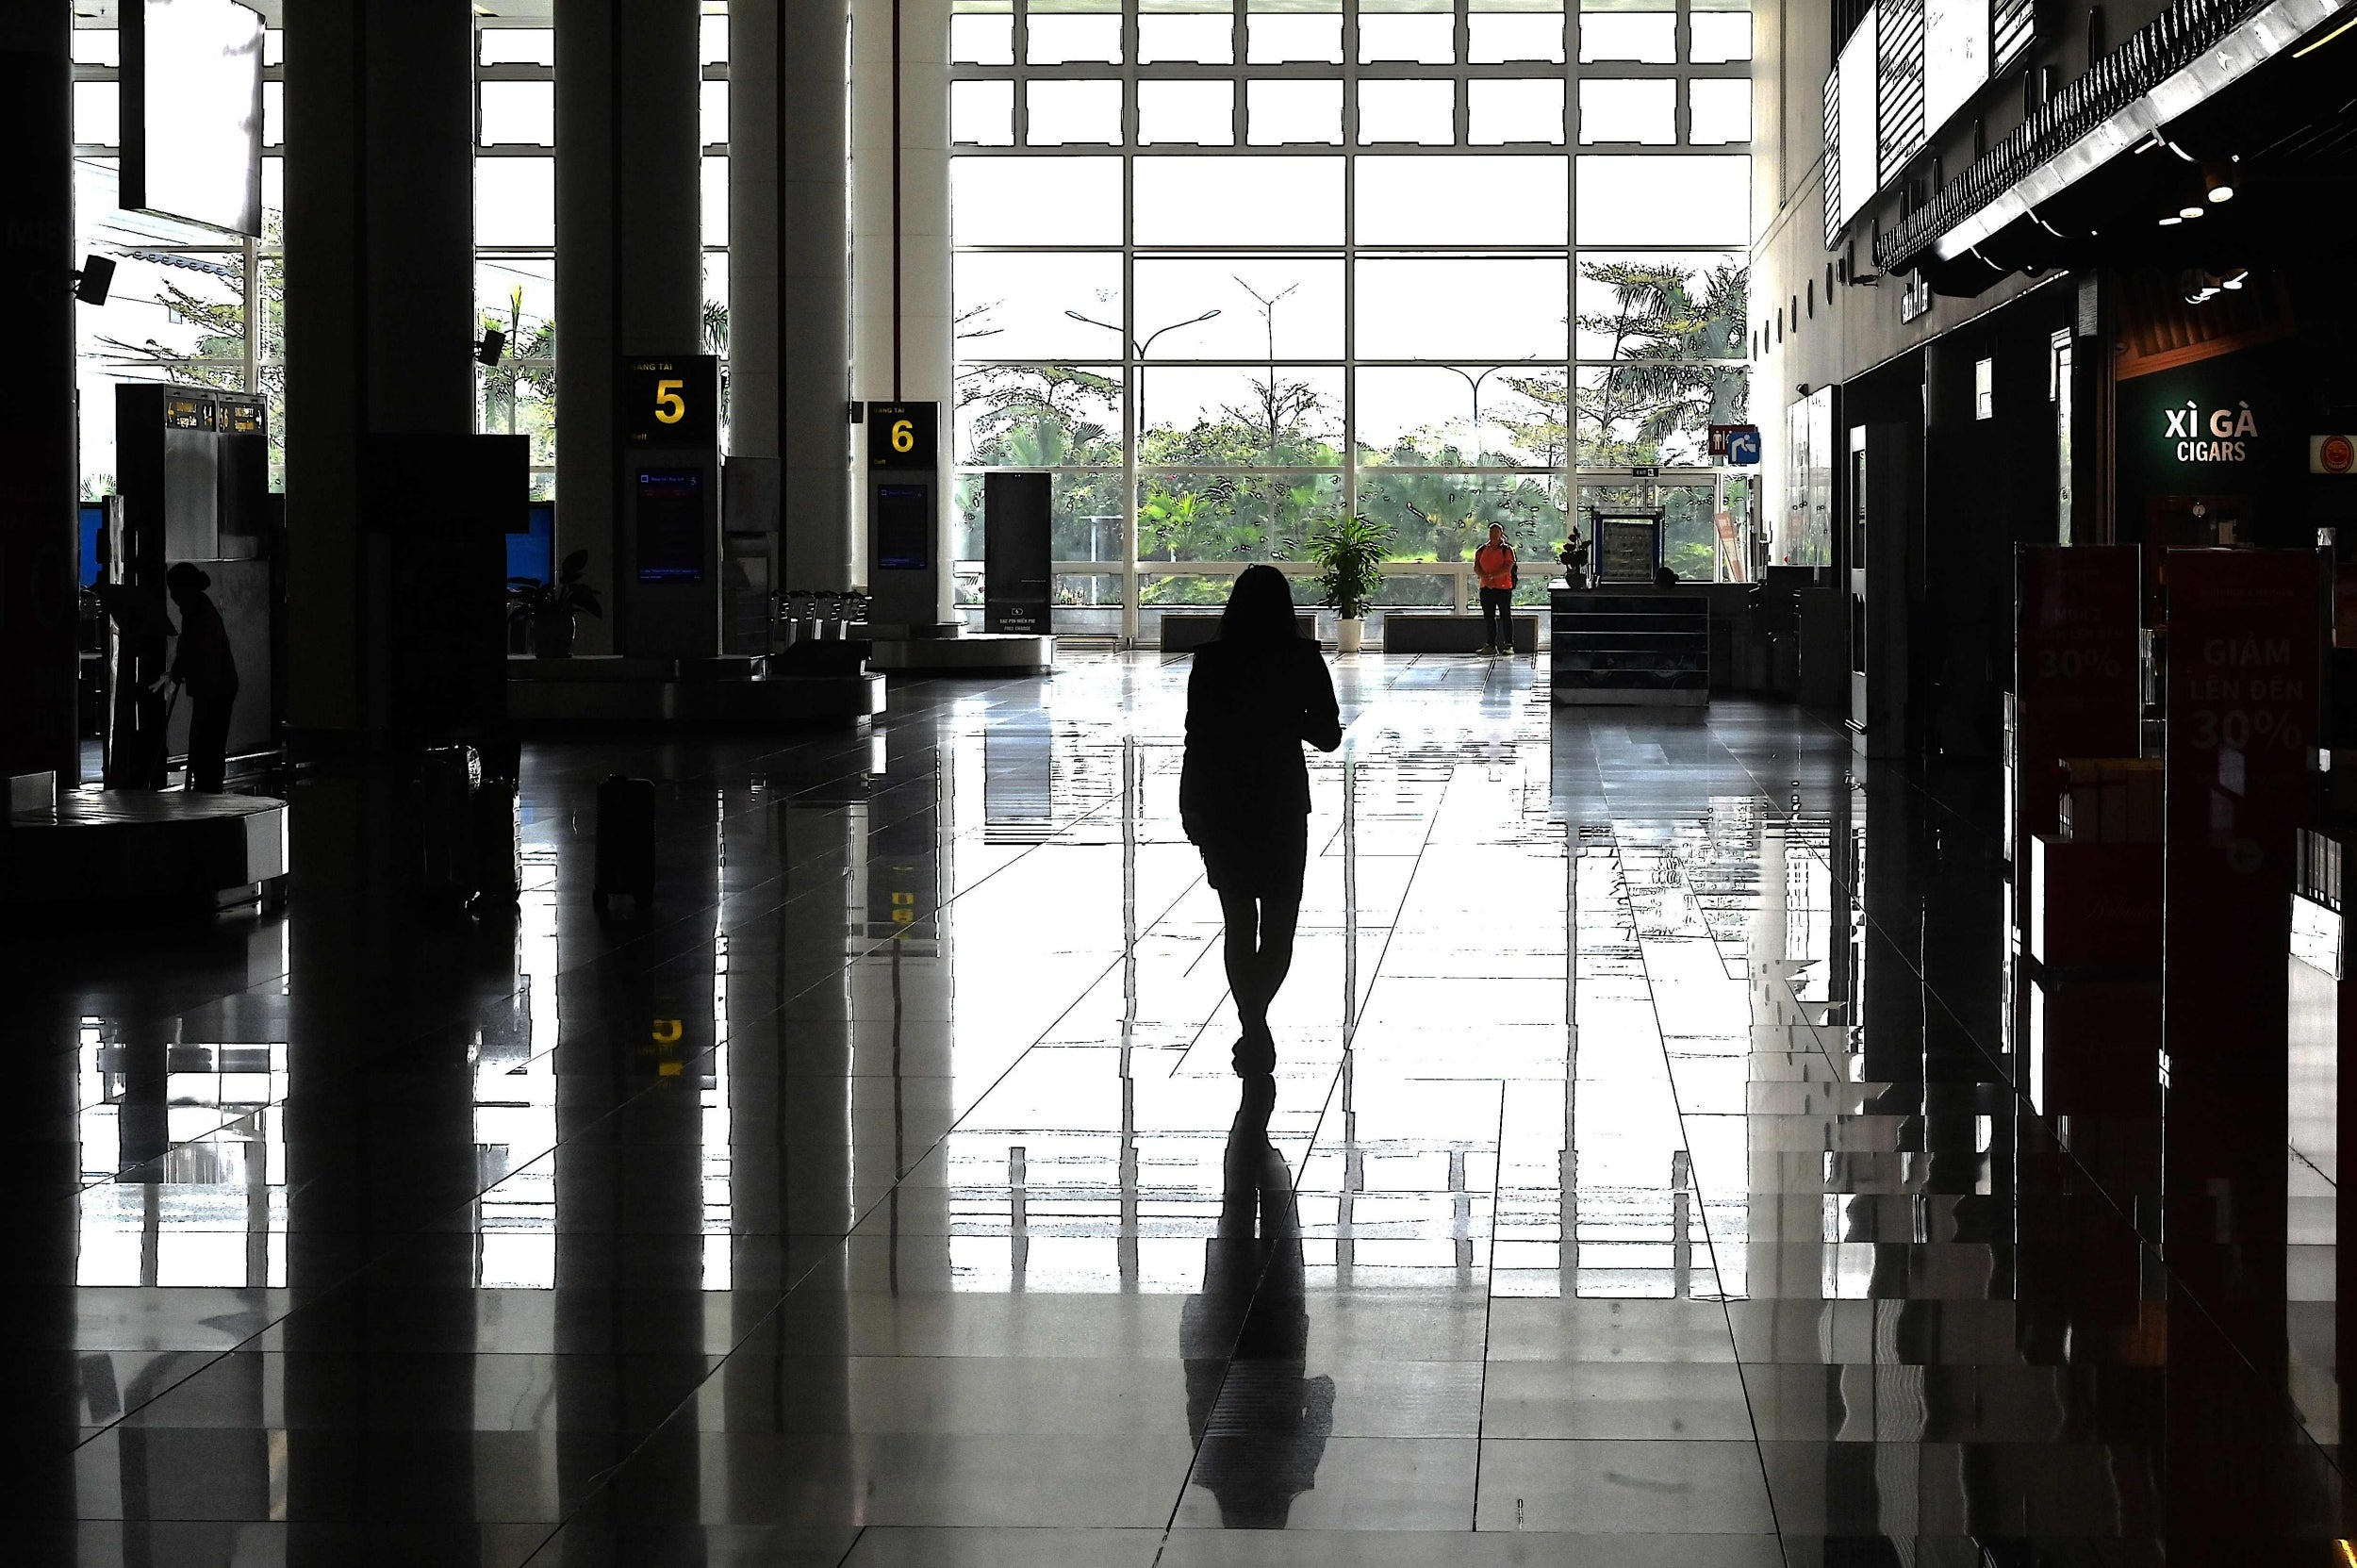 Noi Bai International Airport, Vietnam